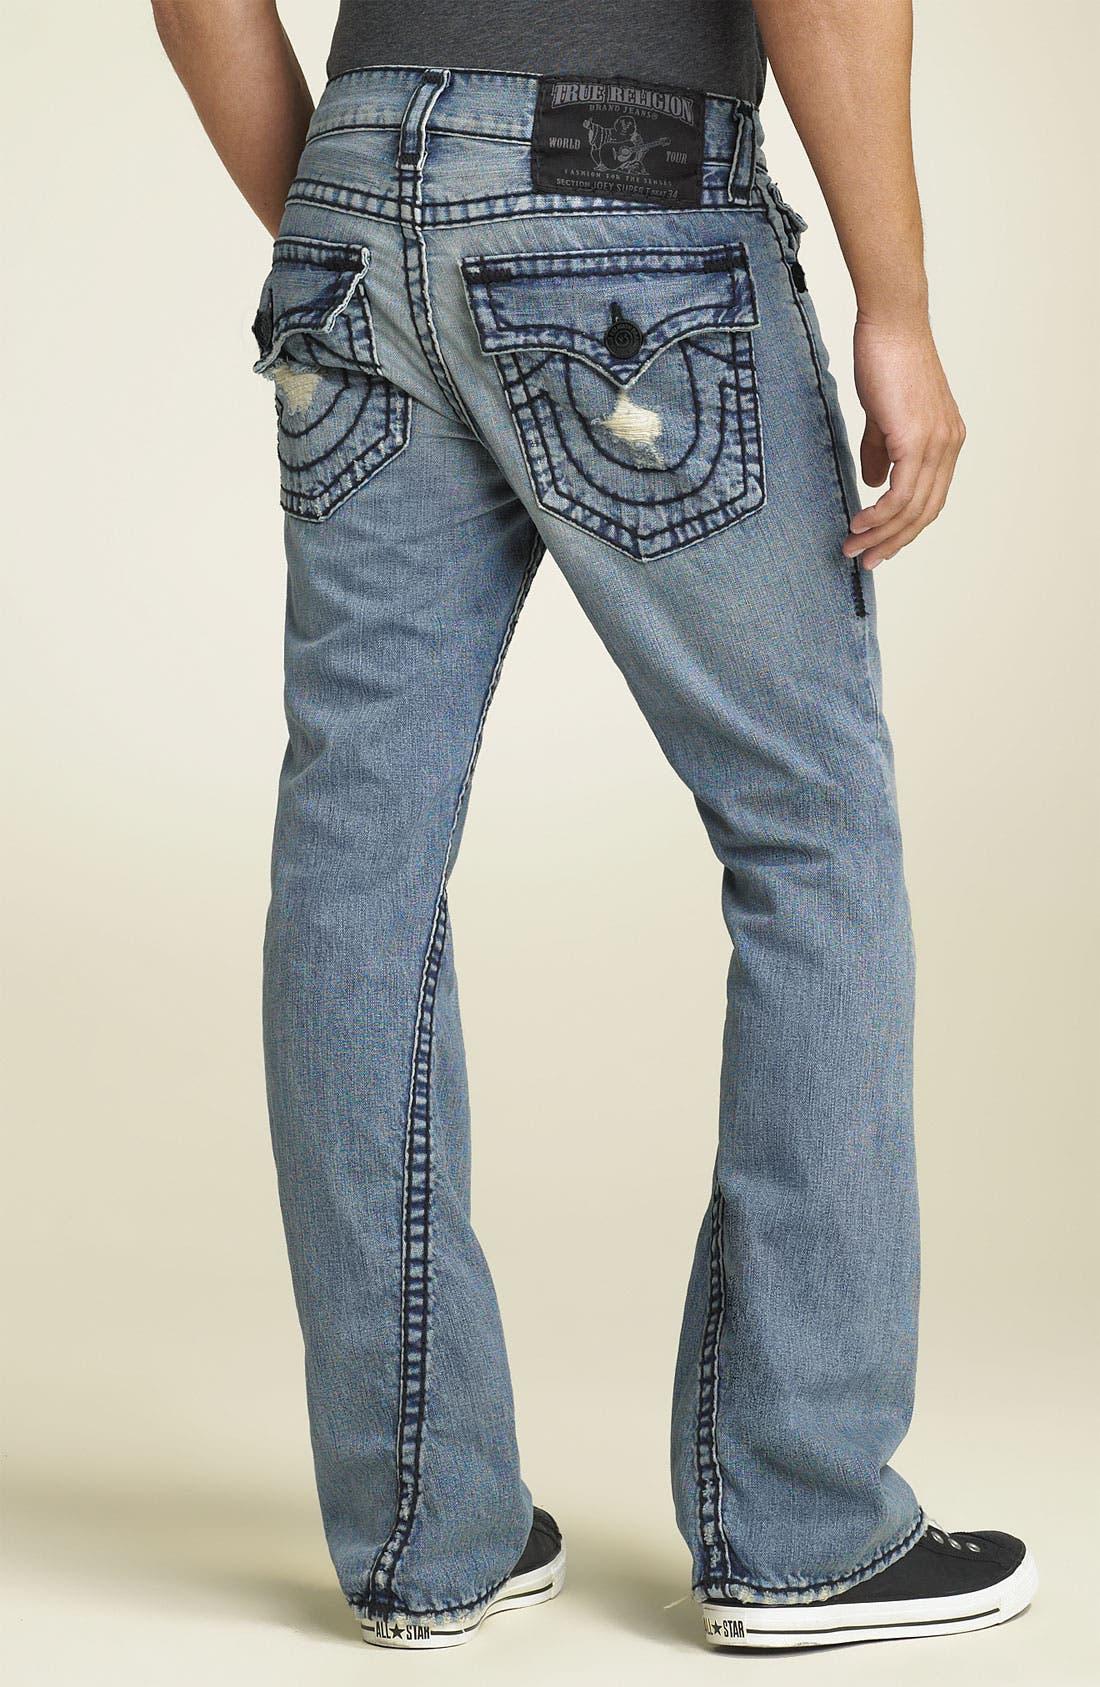 Main Image - True Religion Brand Jeans 'Joey - Black Super T' Bootcut Jeans (Cowboy Destroyed Wash)